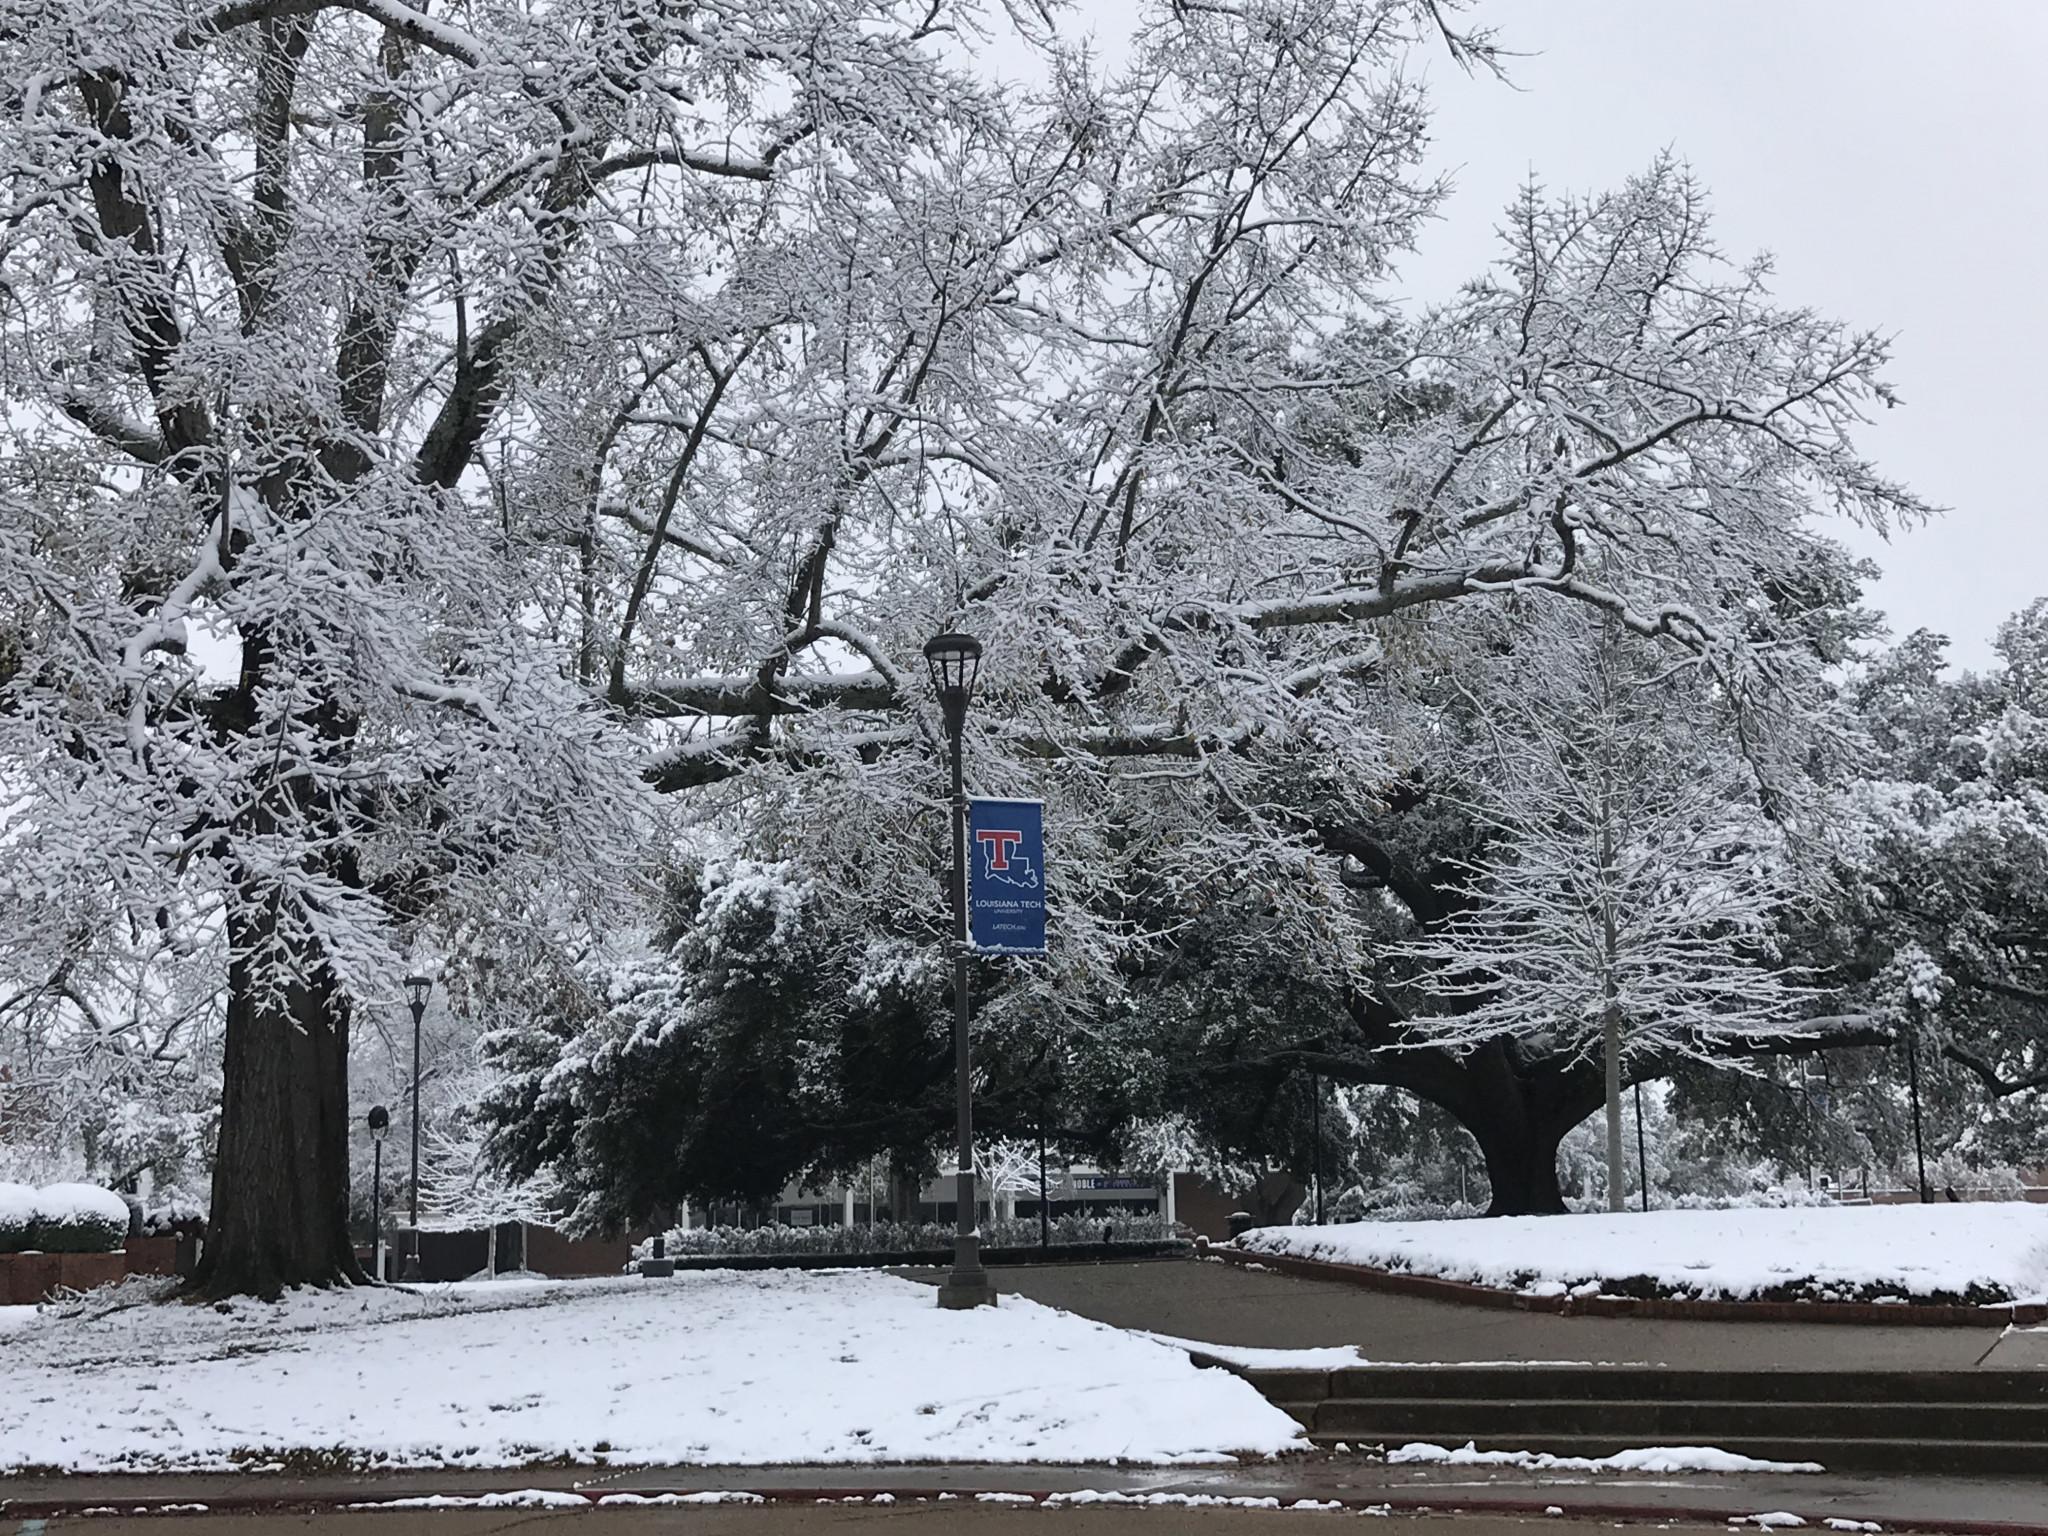 Scenes from the Quad area of Louisiana Tech campus - Leader photo by Caleb Daniel